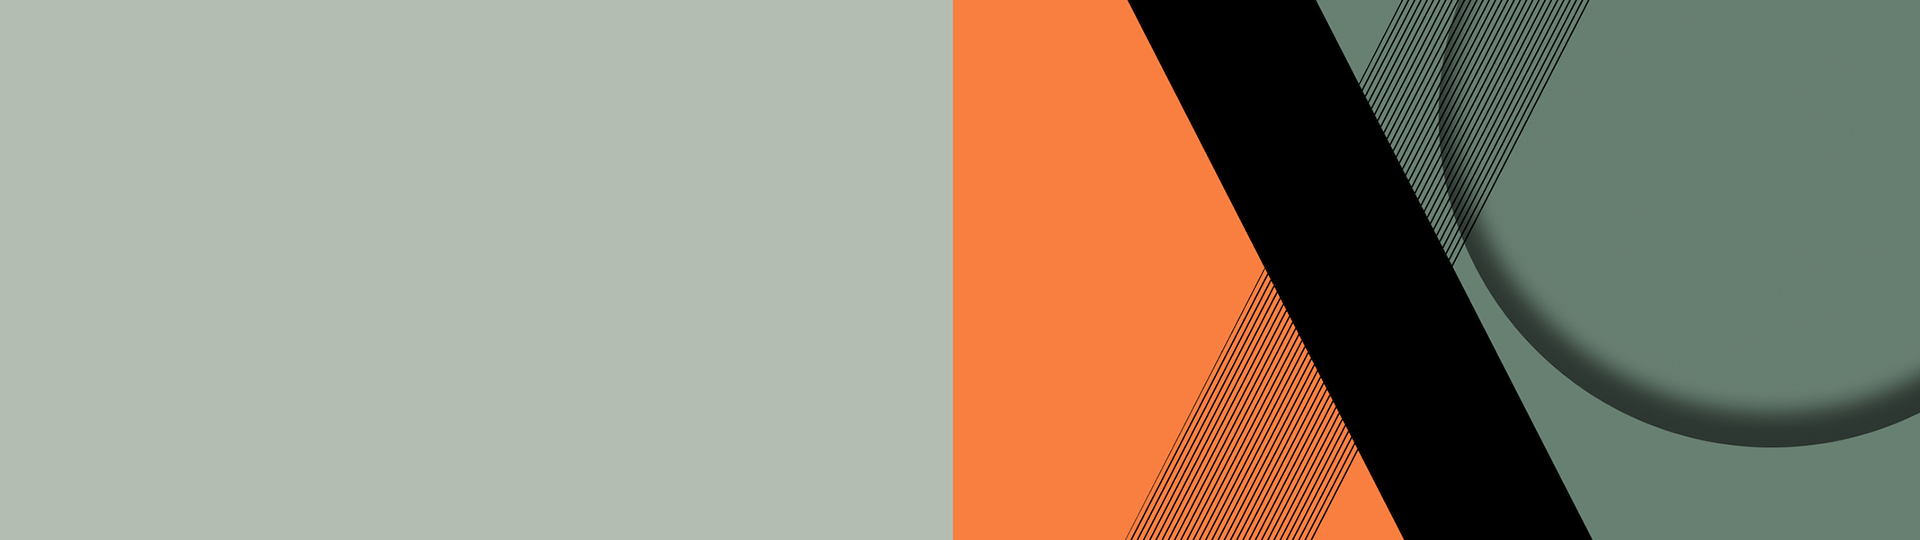 Banner_web_2